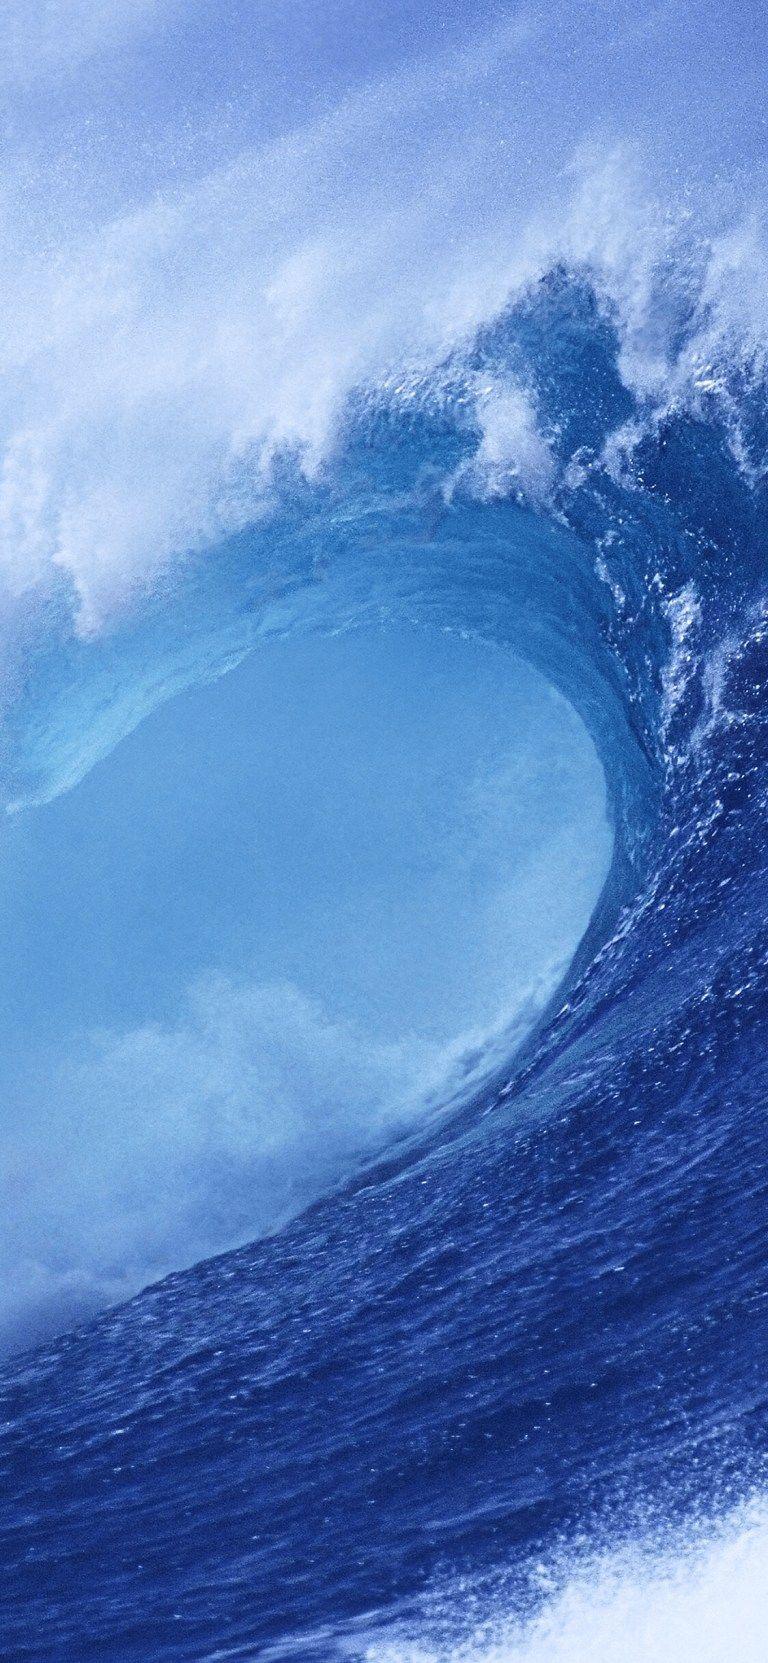 Blue Wave Ios 7 Wallpaper Ios Wallpapers Ios 10 Wallpaper